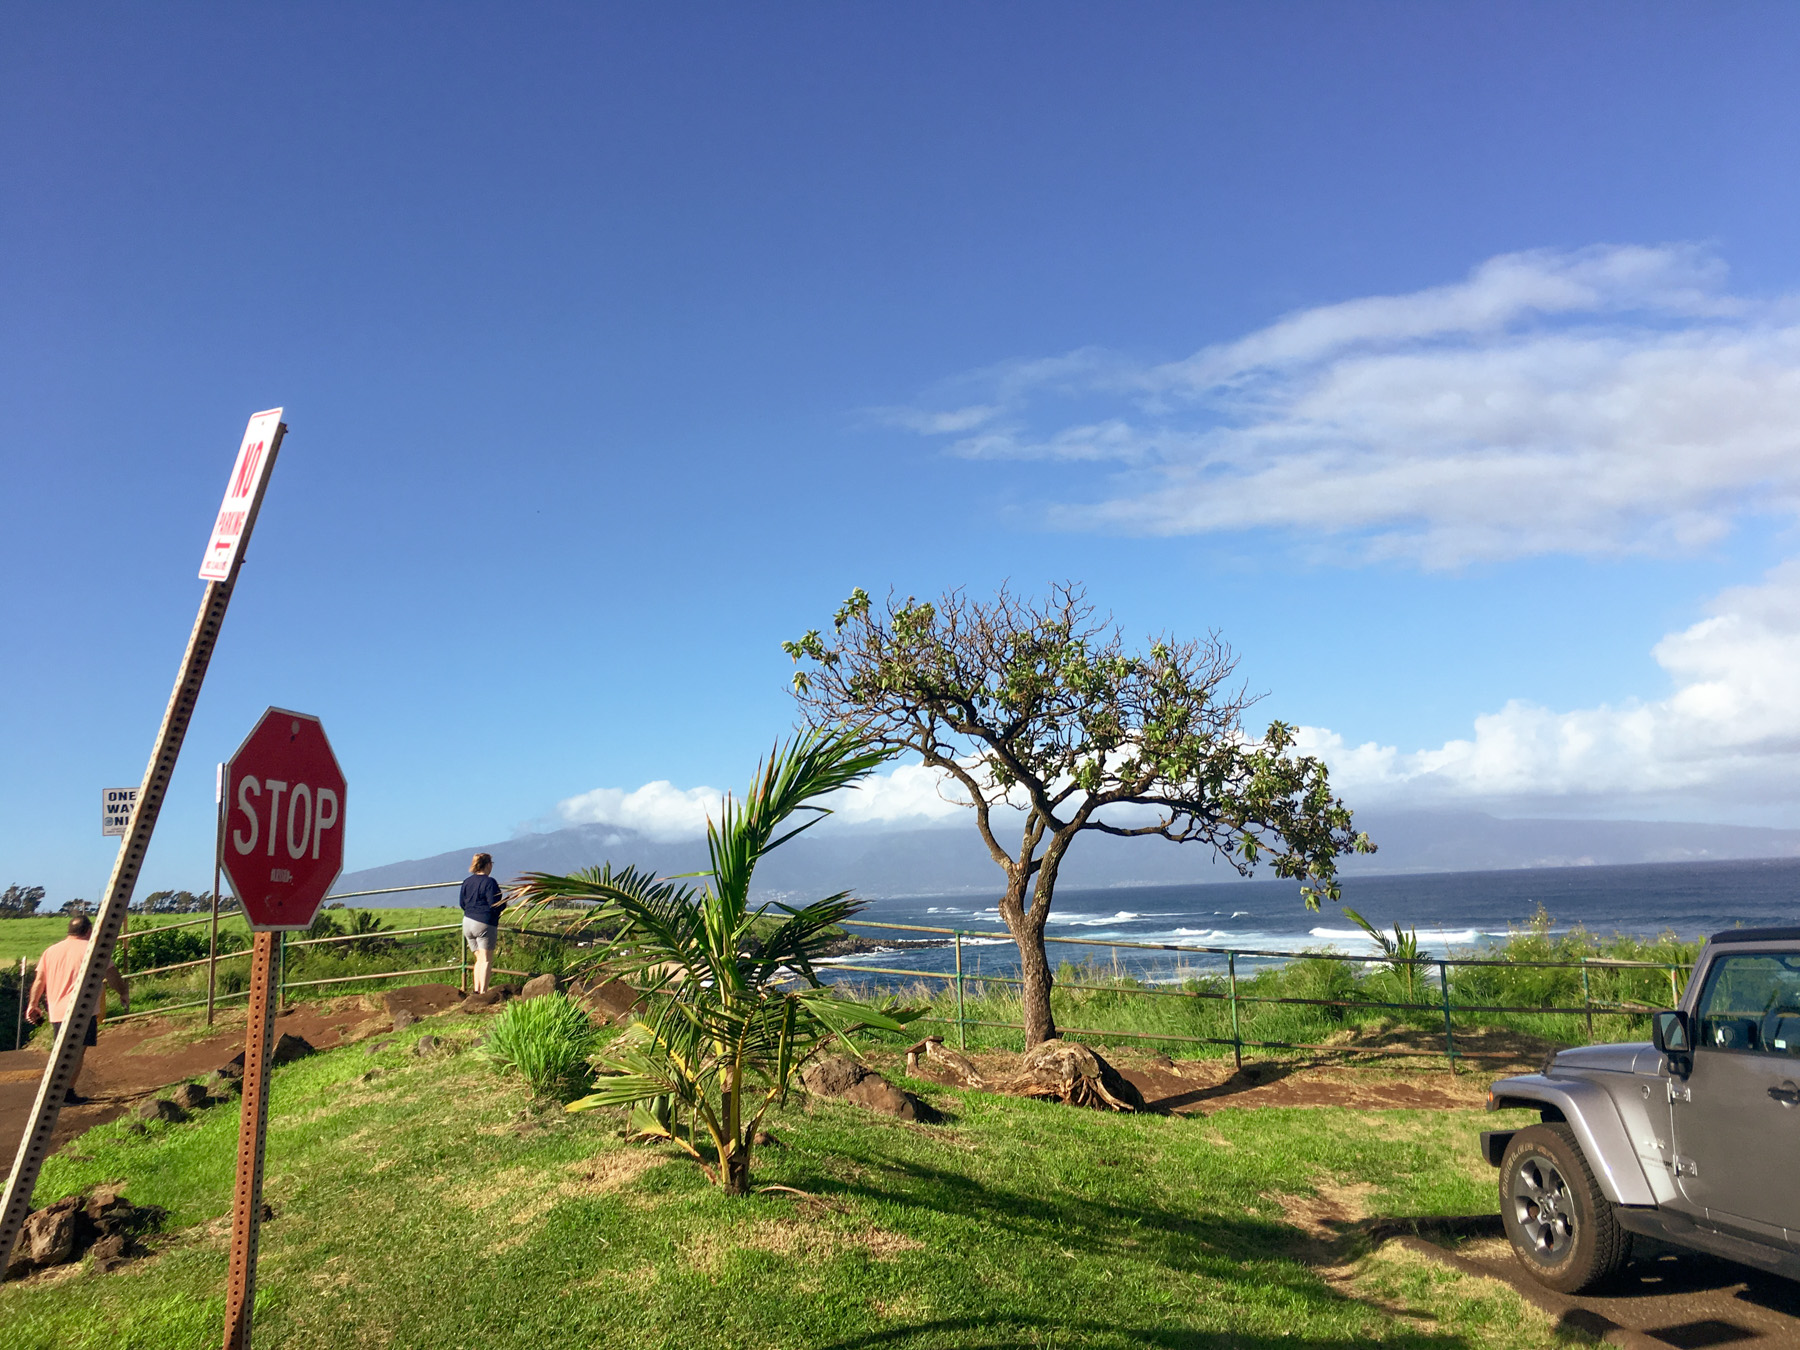 Maui-Trip-Kite-66.jpg